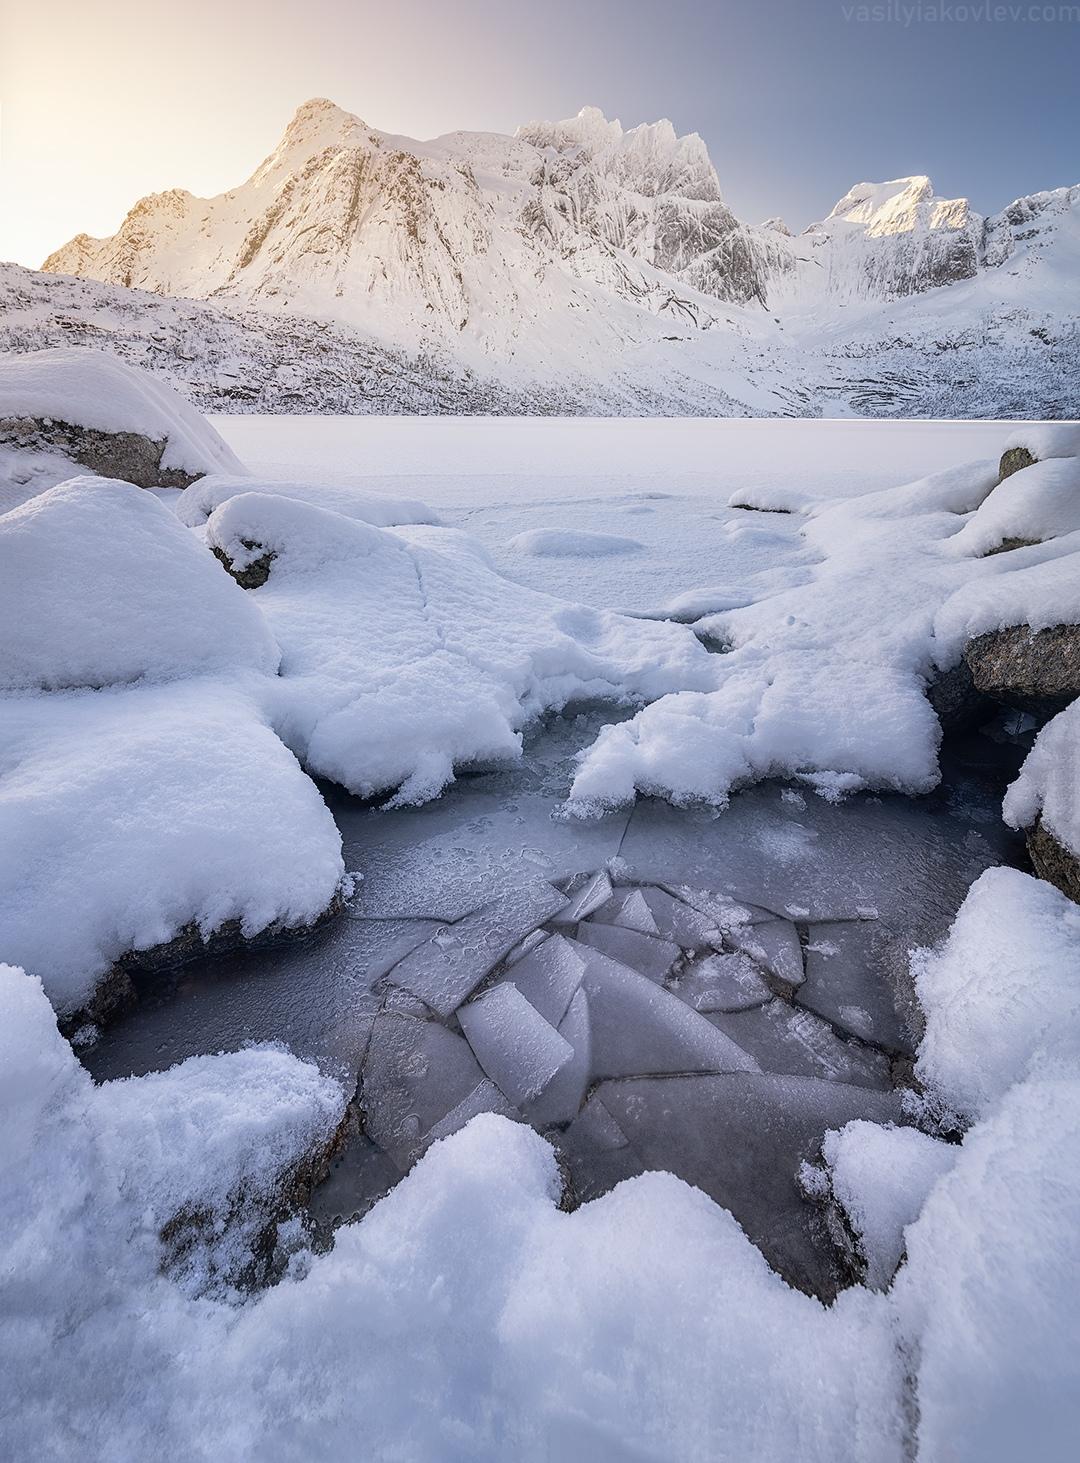 Winter Lake Storvatnet, Lofoten Islands, Norway